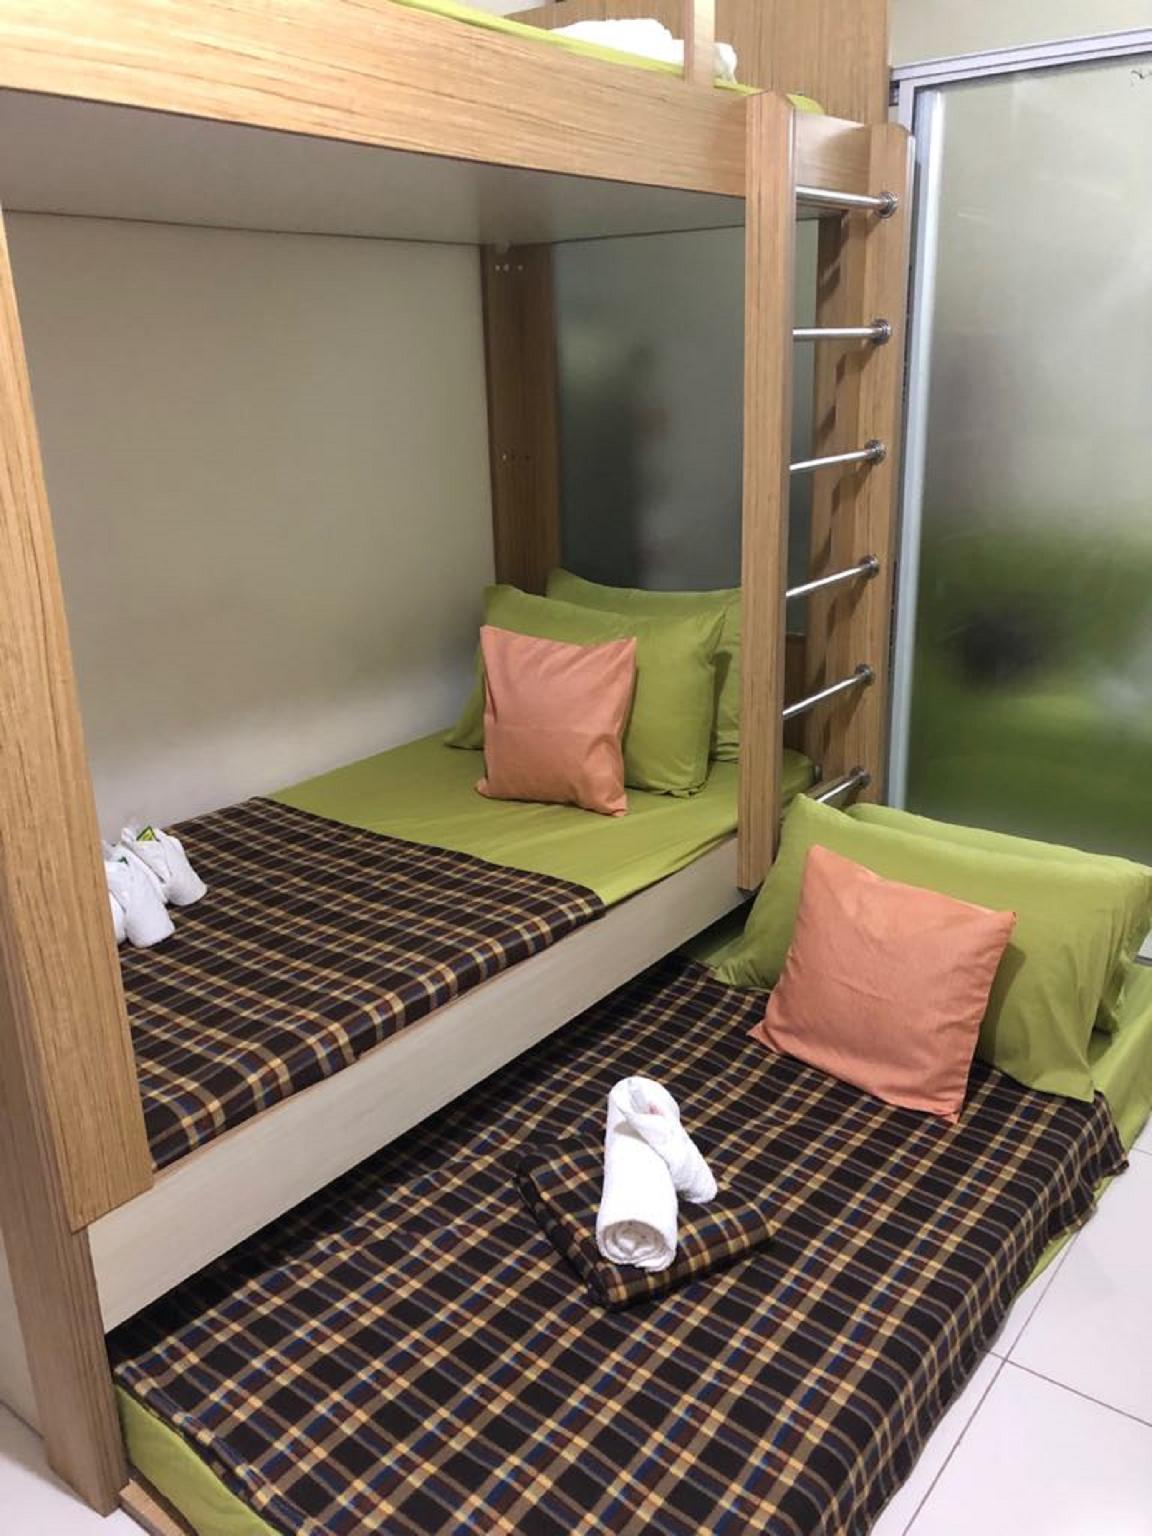 Green 1 Bedroom Condo In Metro Manila W Netflix